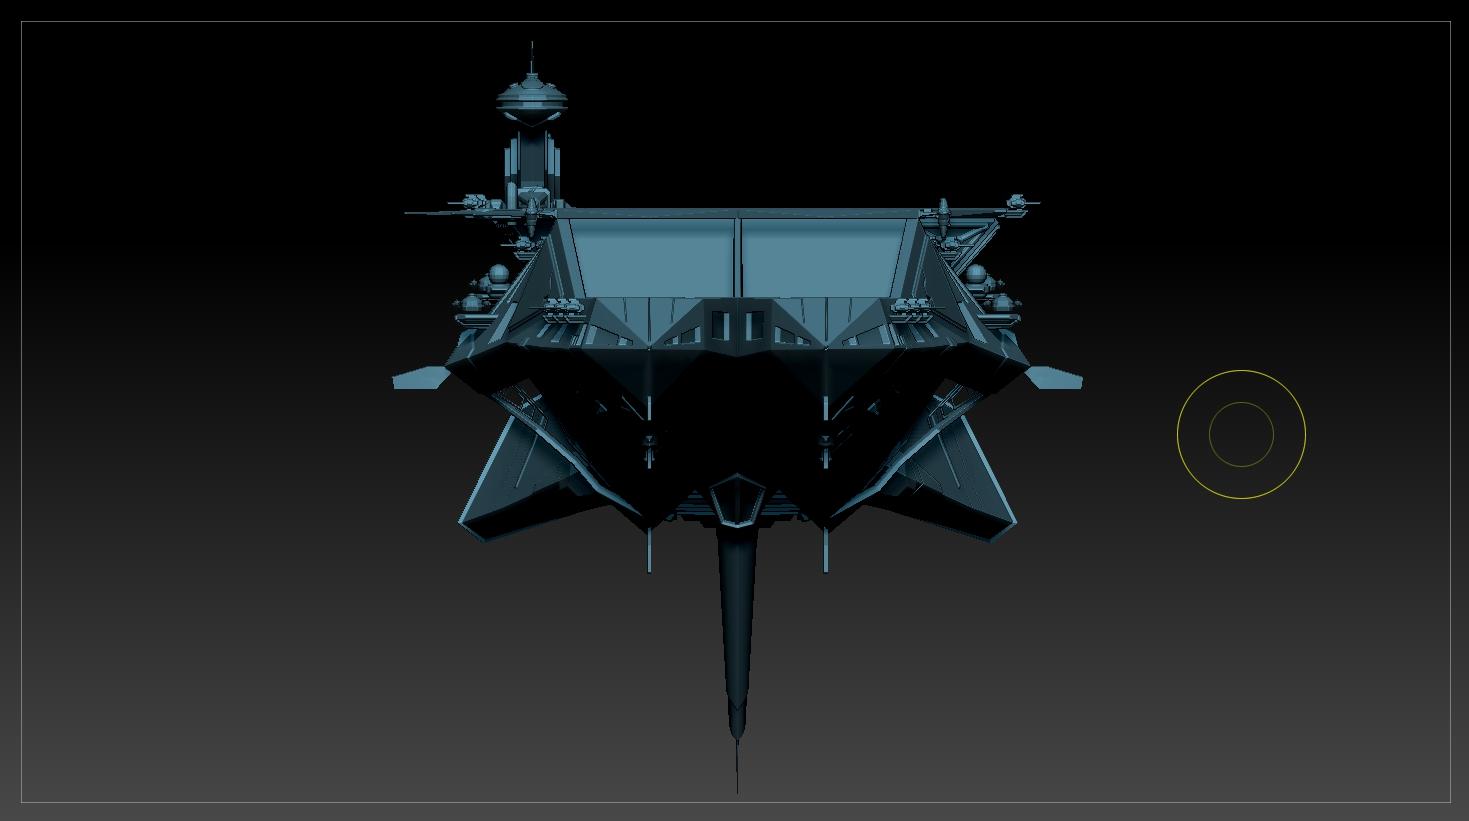 Uraga Class Carrier Img 4 04